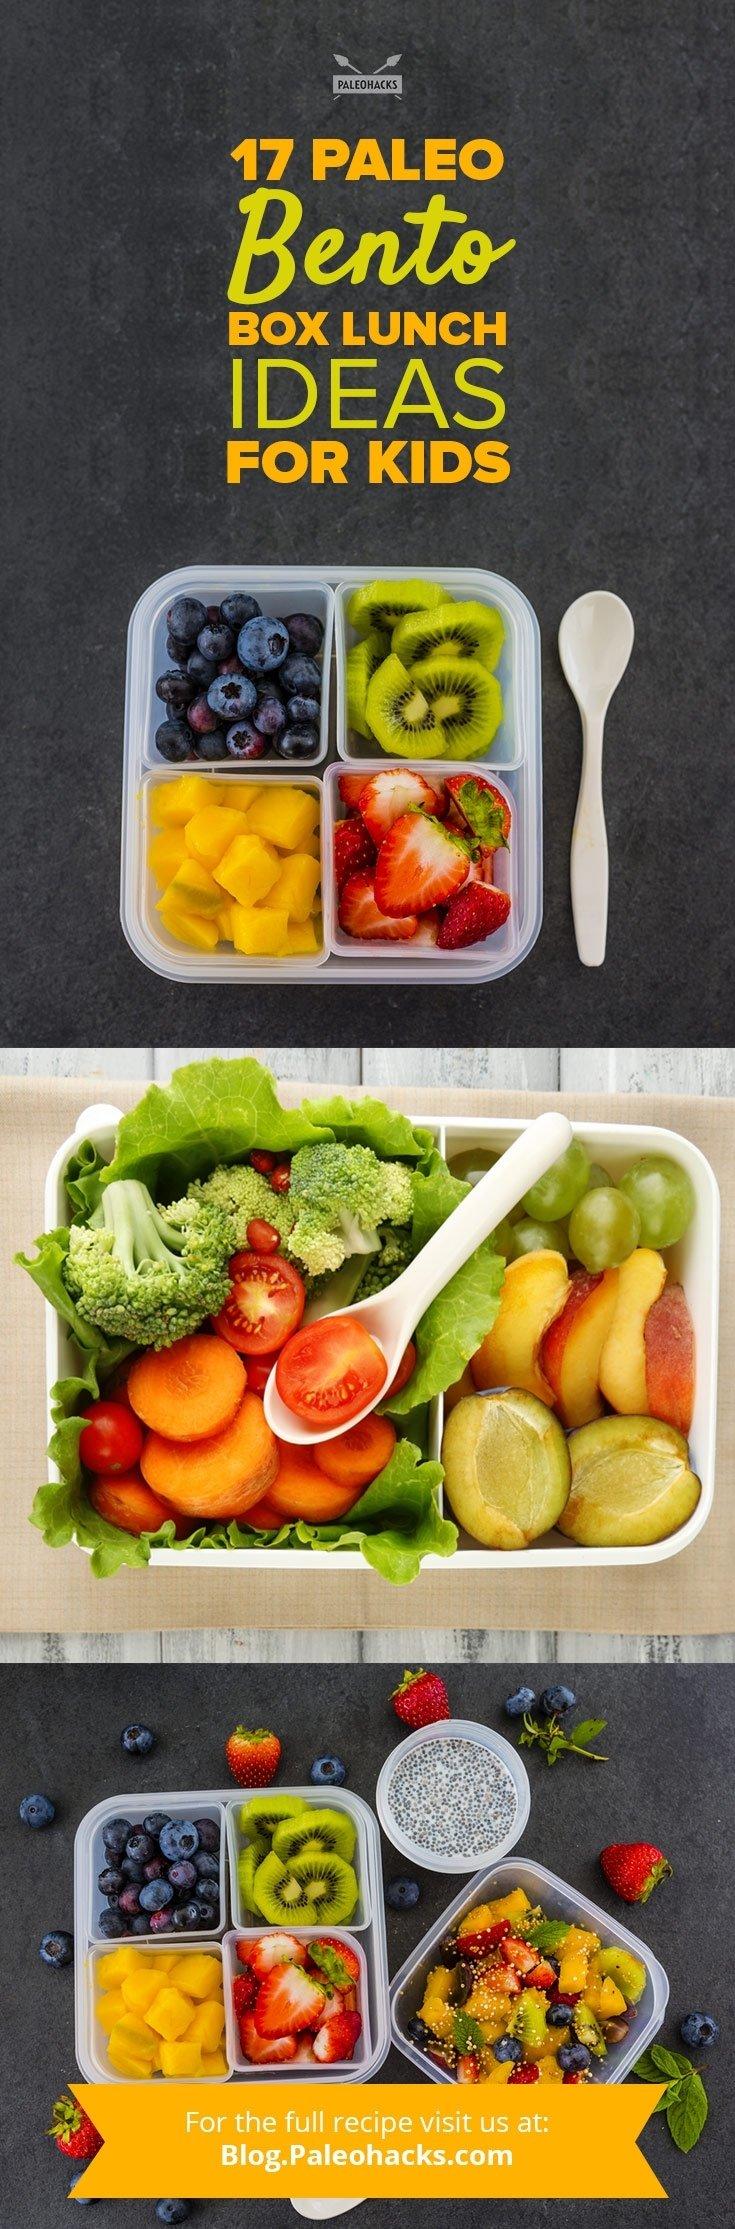 10 Wonderful Paleo Lunch Ideas For Kids 17 paleo bento box lunch ideas for kids skewers roll ups and fruit 2021